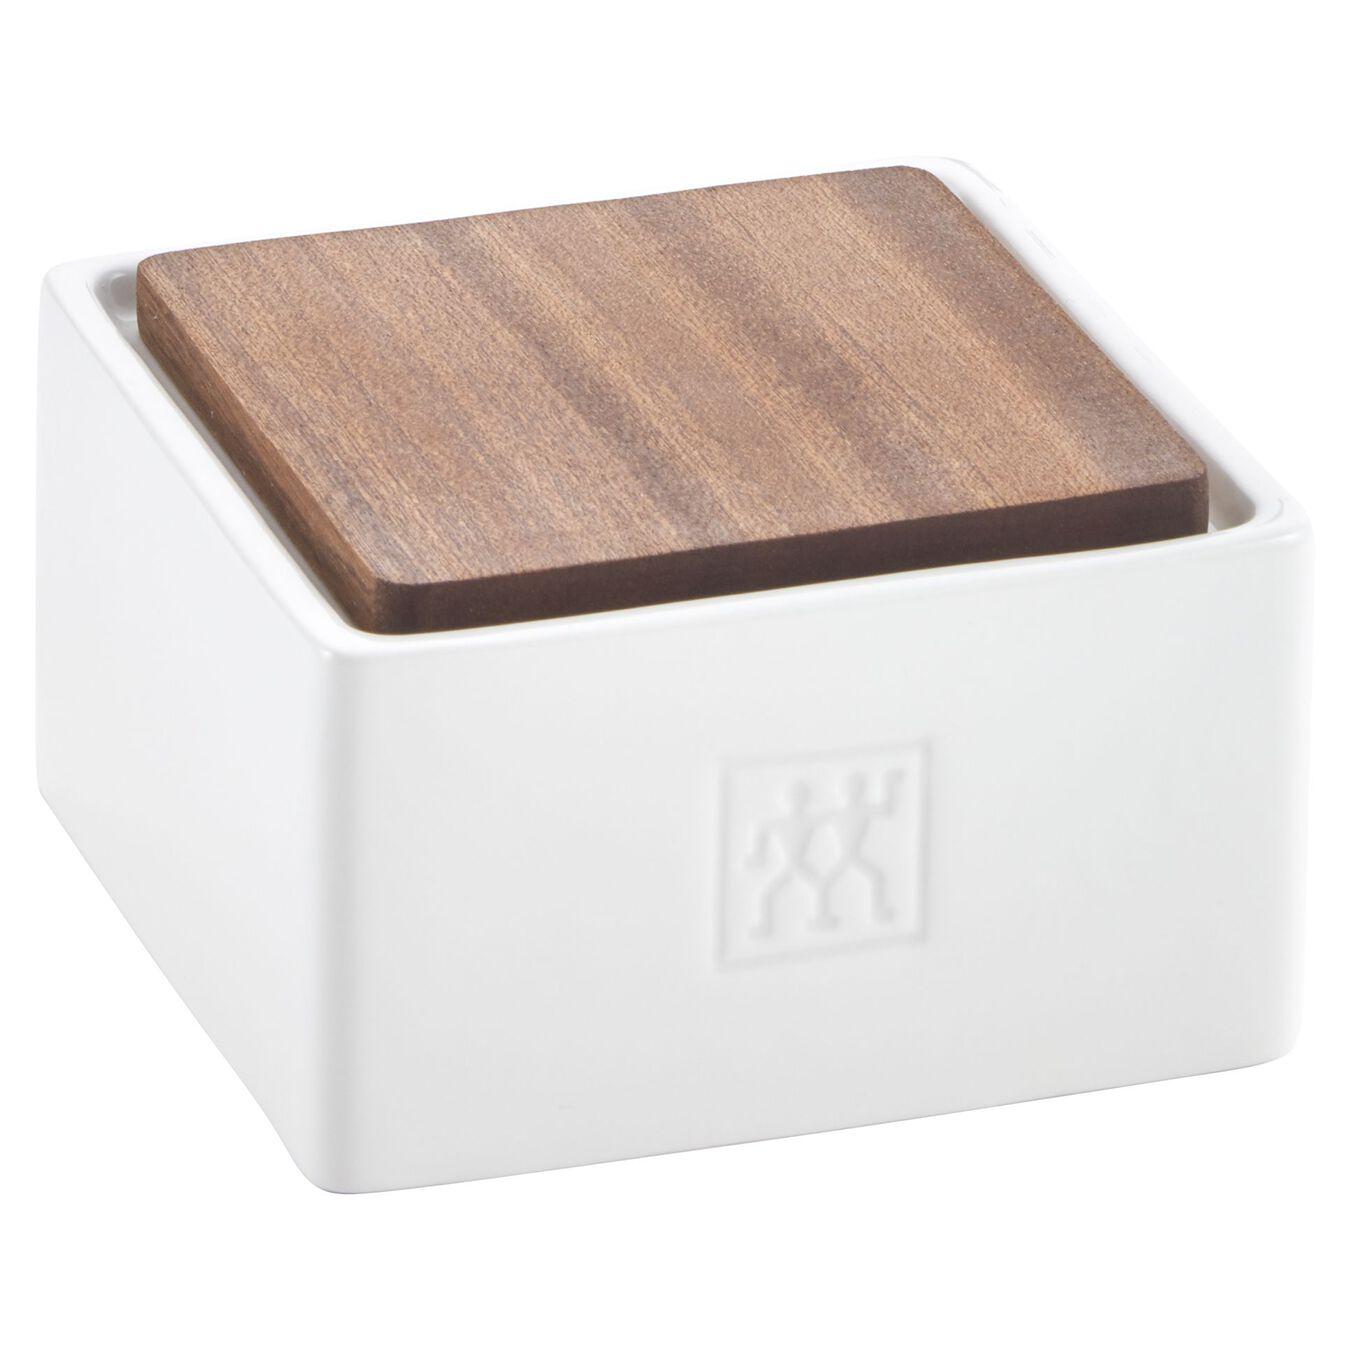 Aufbewahrungsgefäß Set, 4-tlg | Keramik,,large 6